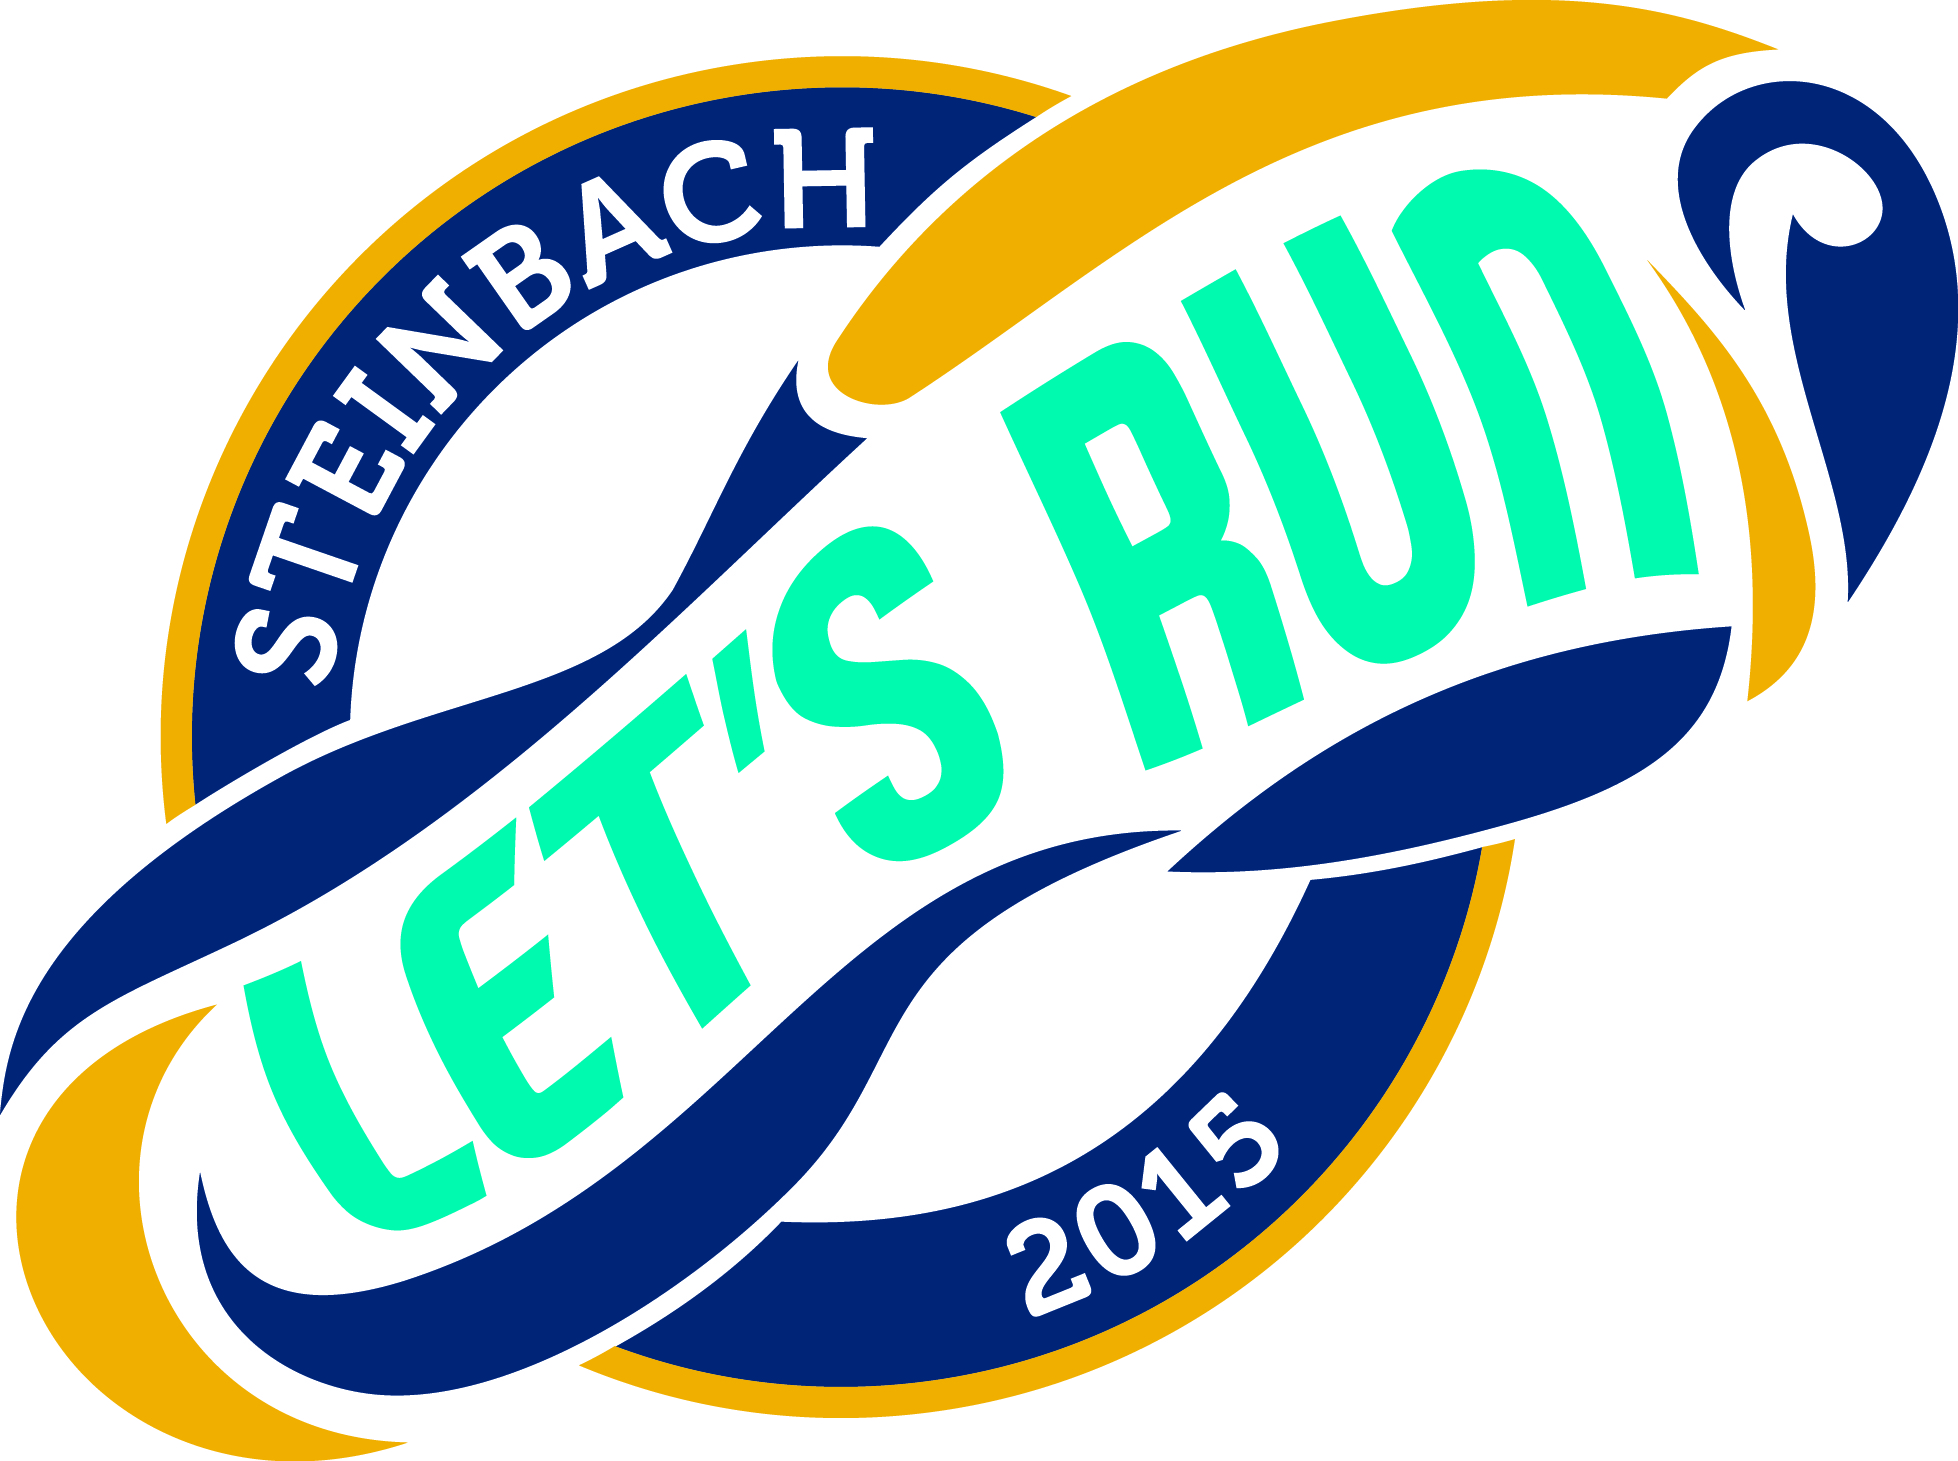 Running Room Online Event Registration.